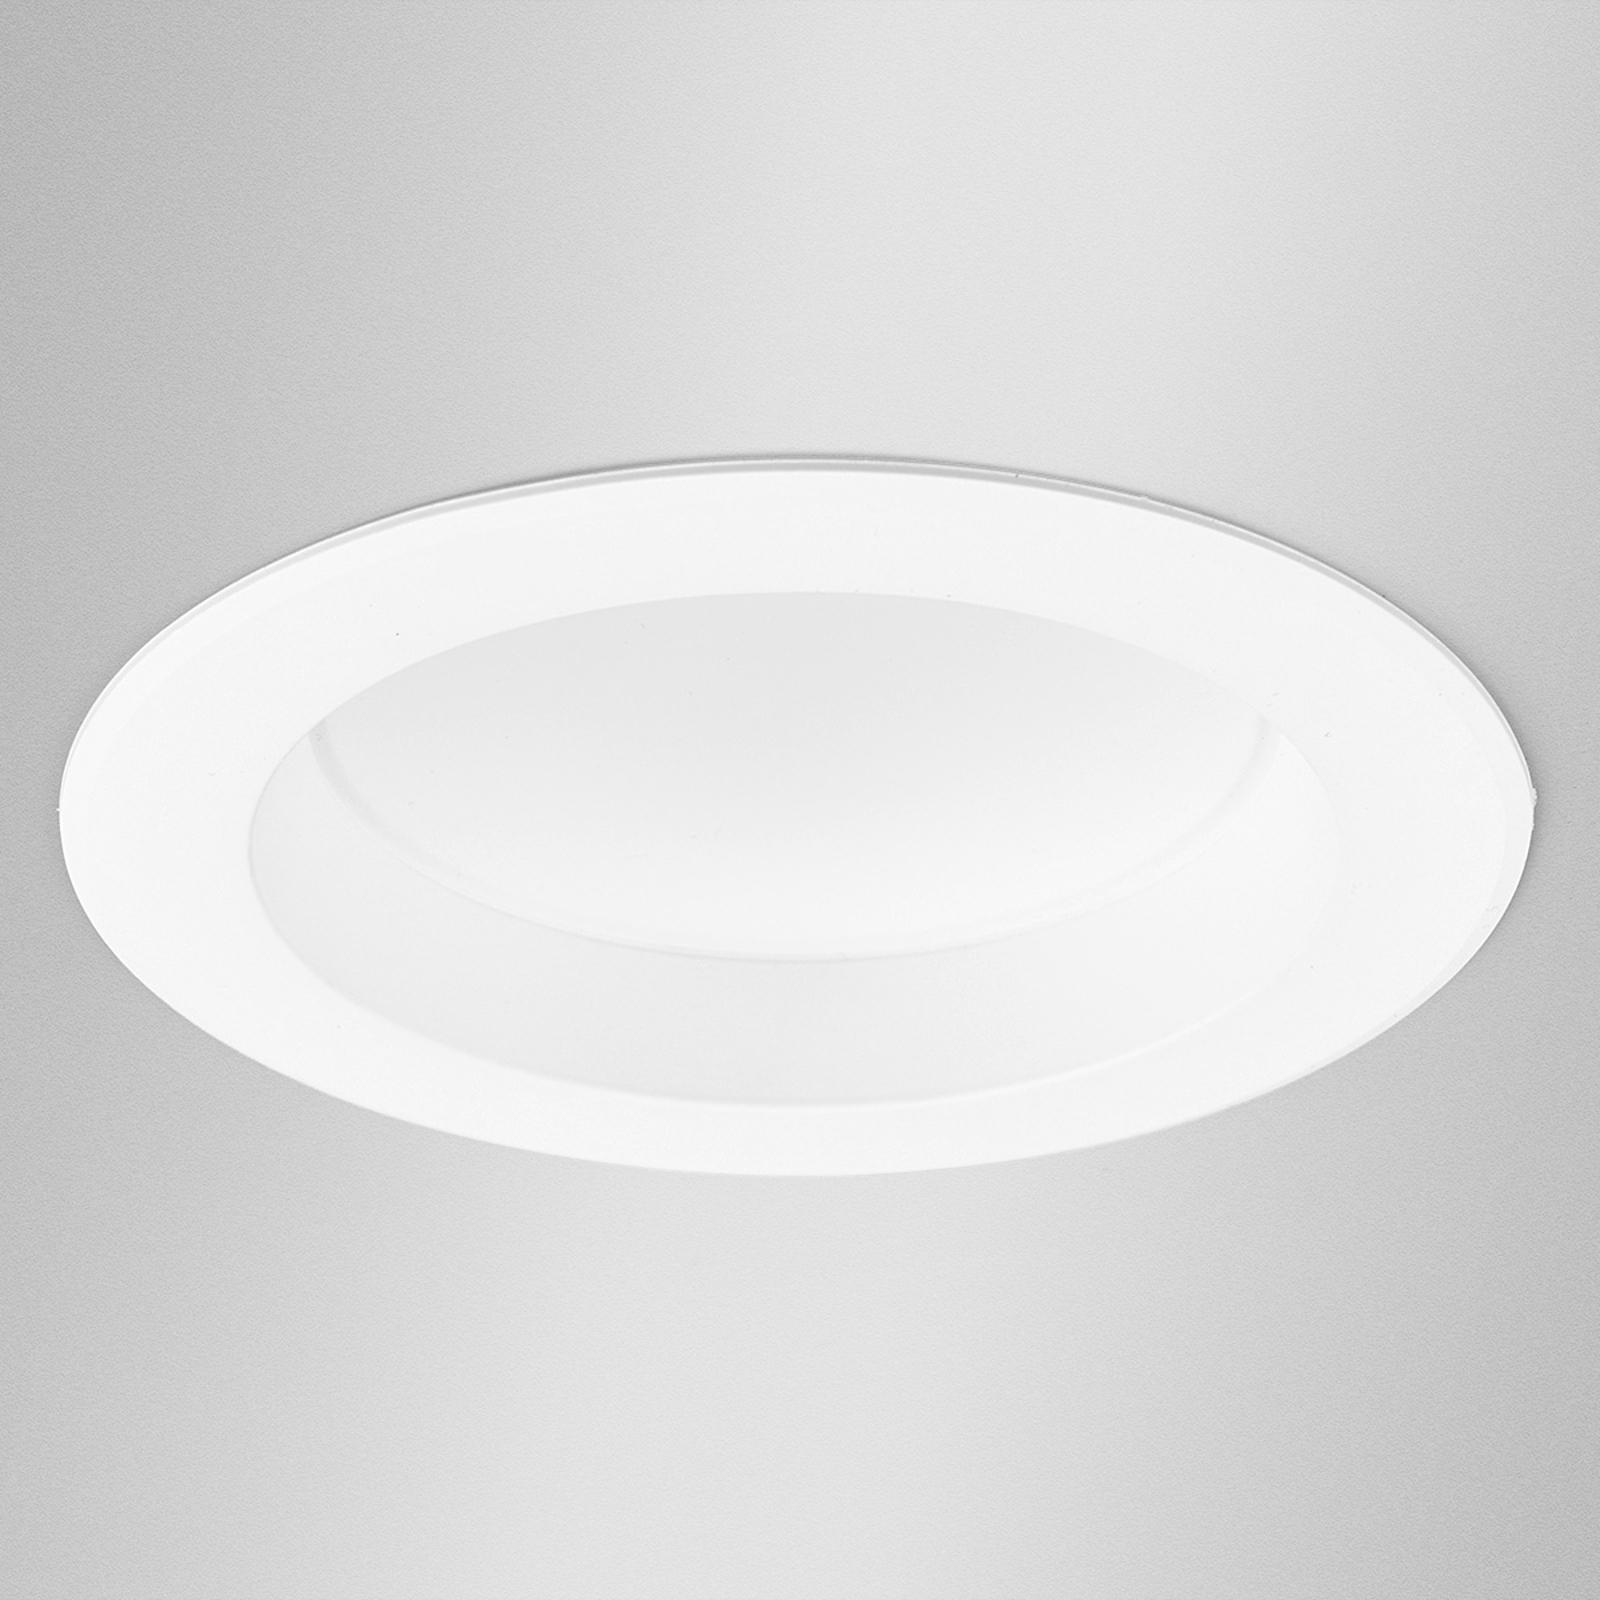 Plafonnier encast. LED Arian 14,5 cm, 12,5W